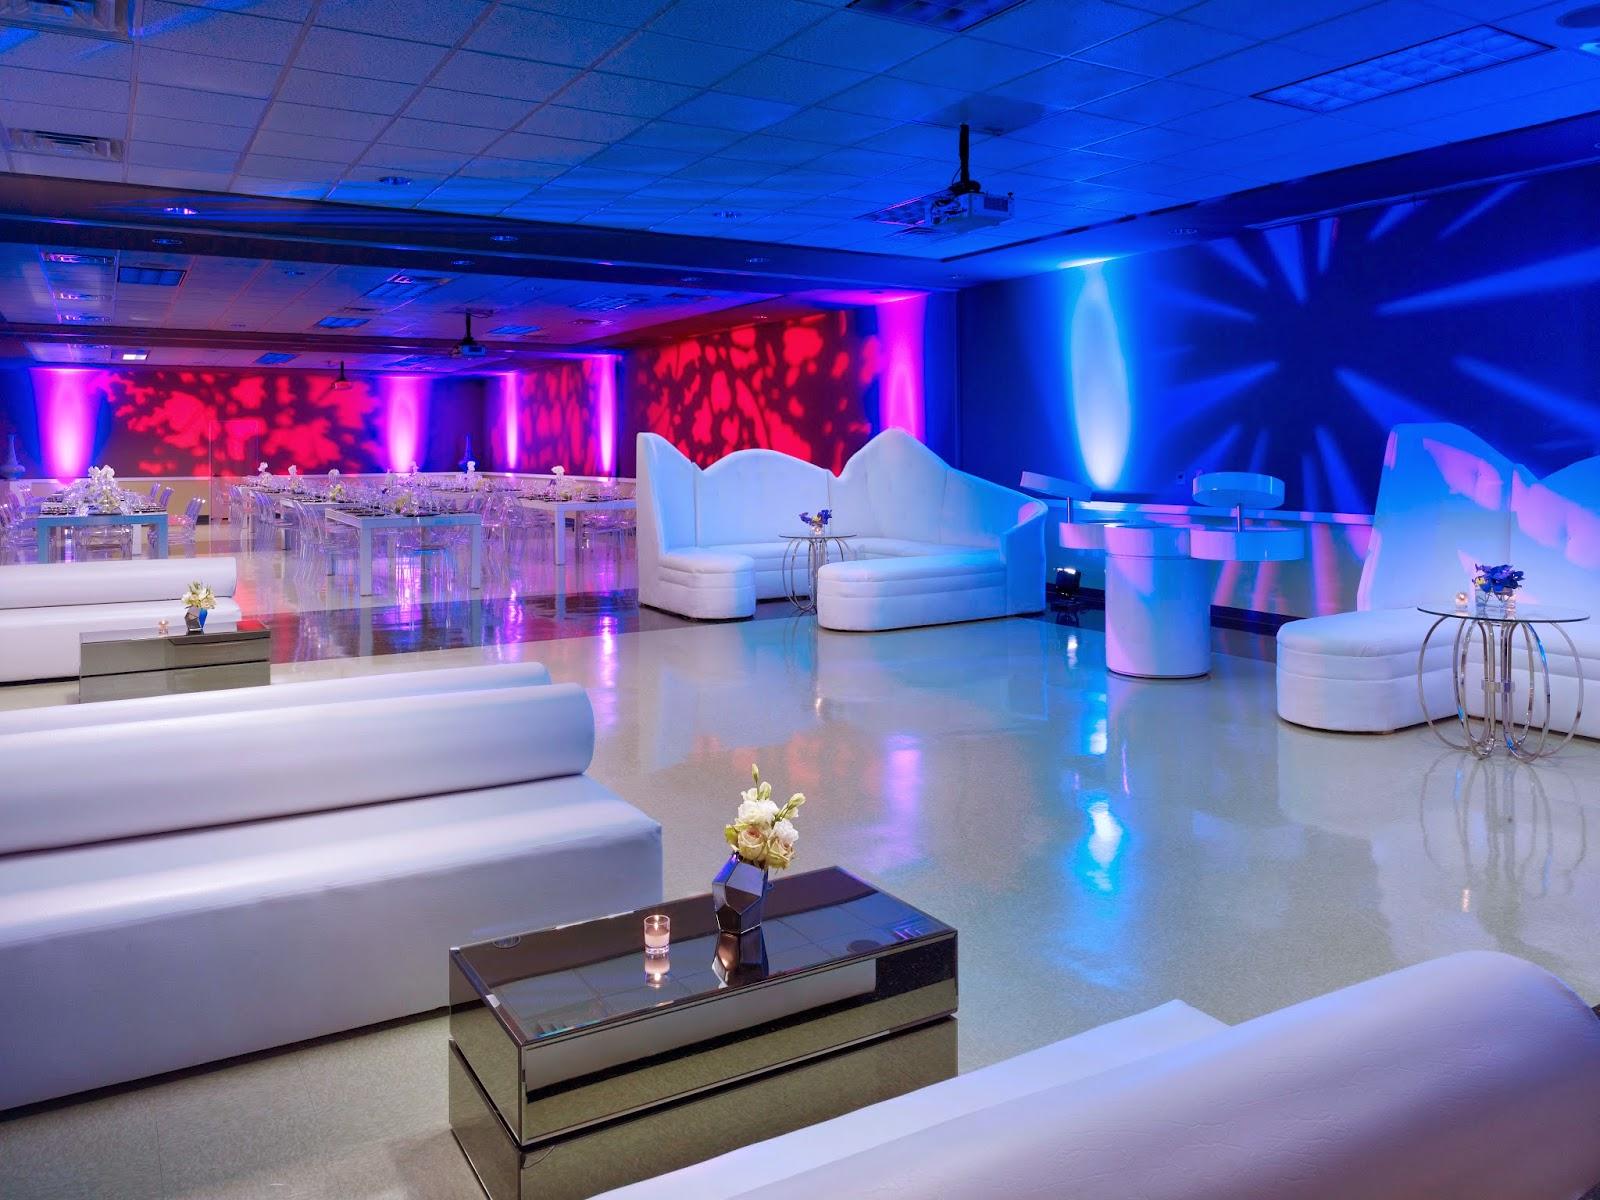 Renting furniture for super bowl events